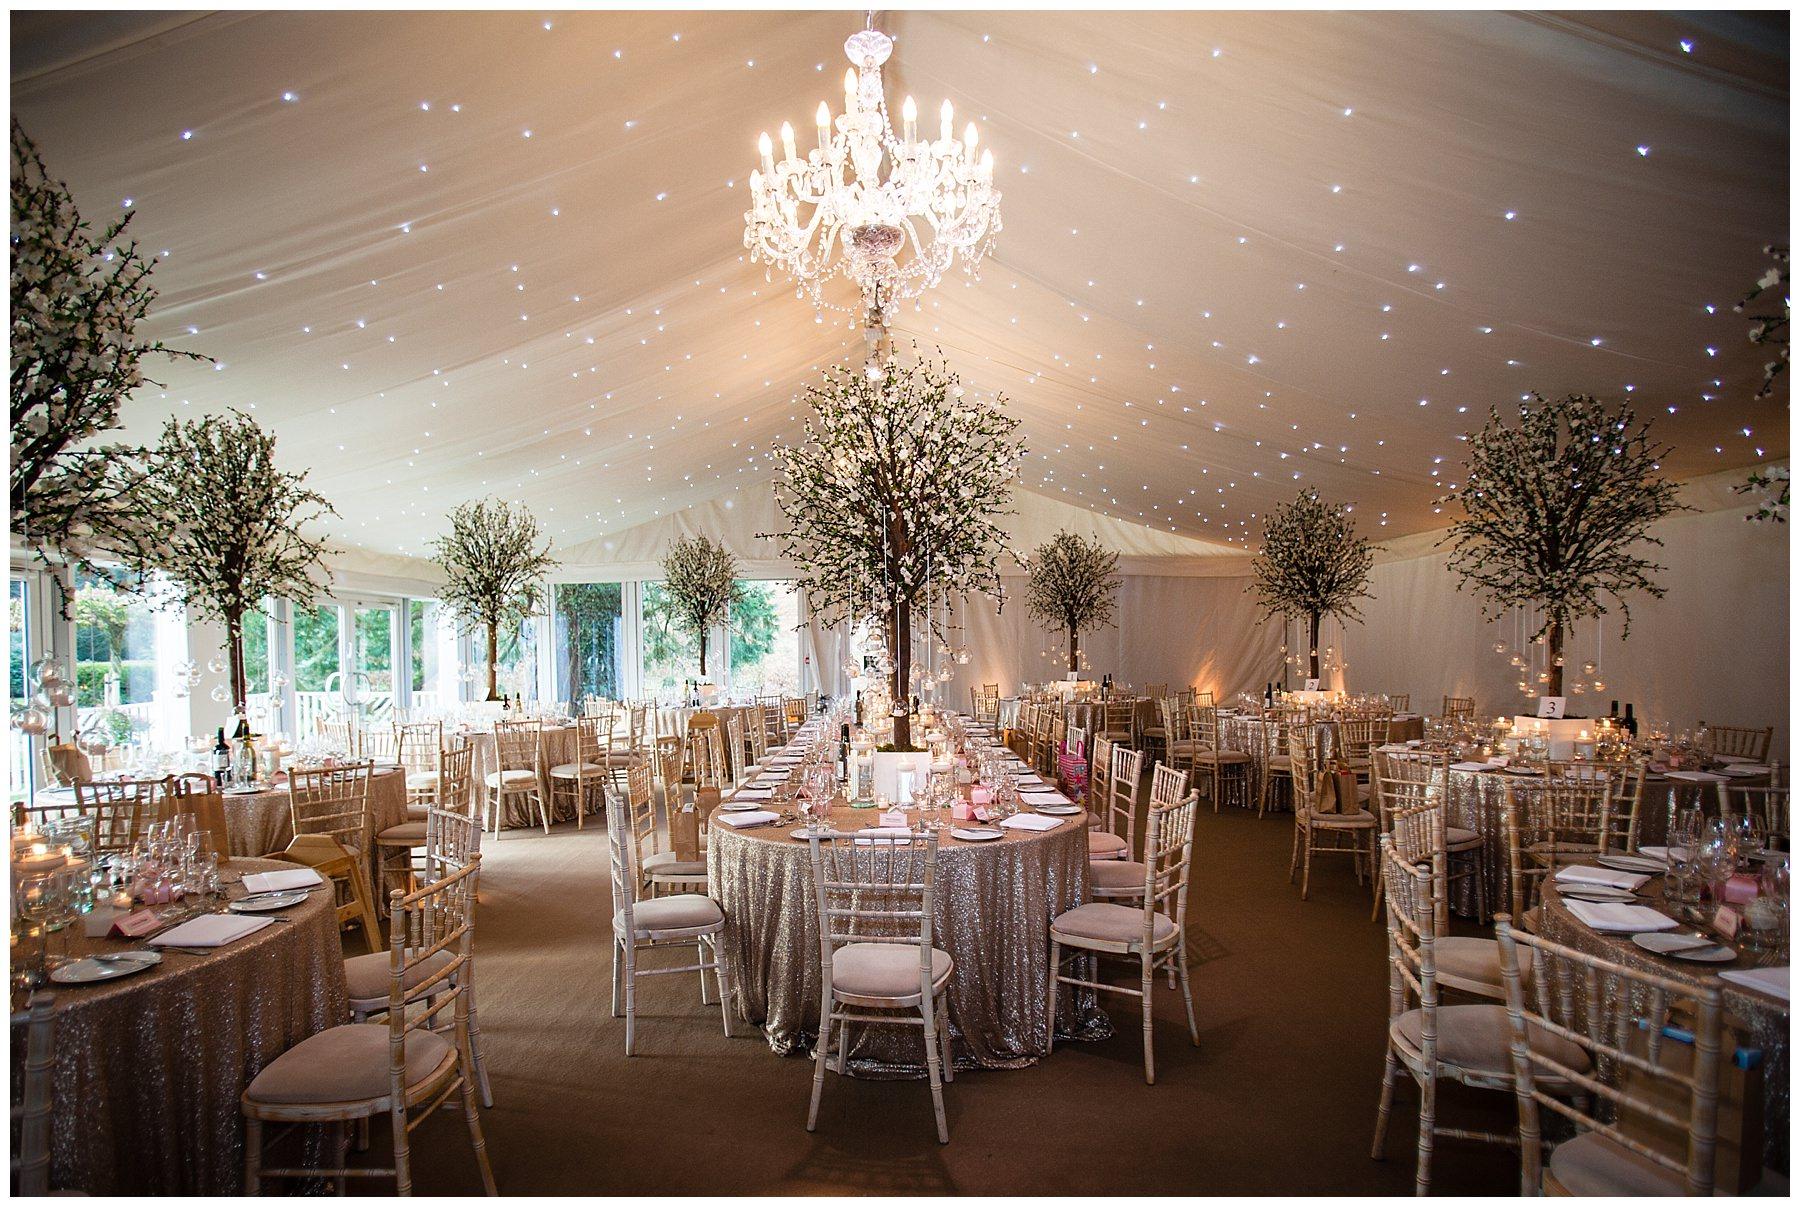 Iscoyd Park Wedding Marquee set up for Winter Wedding Breakfast